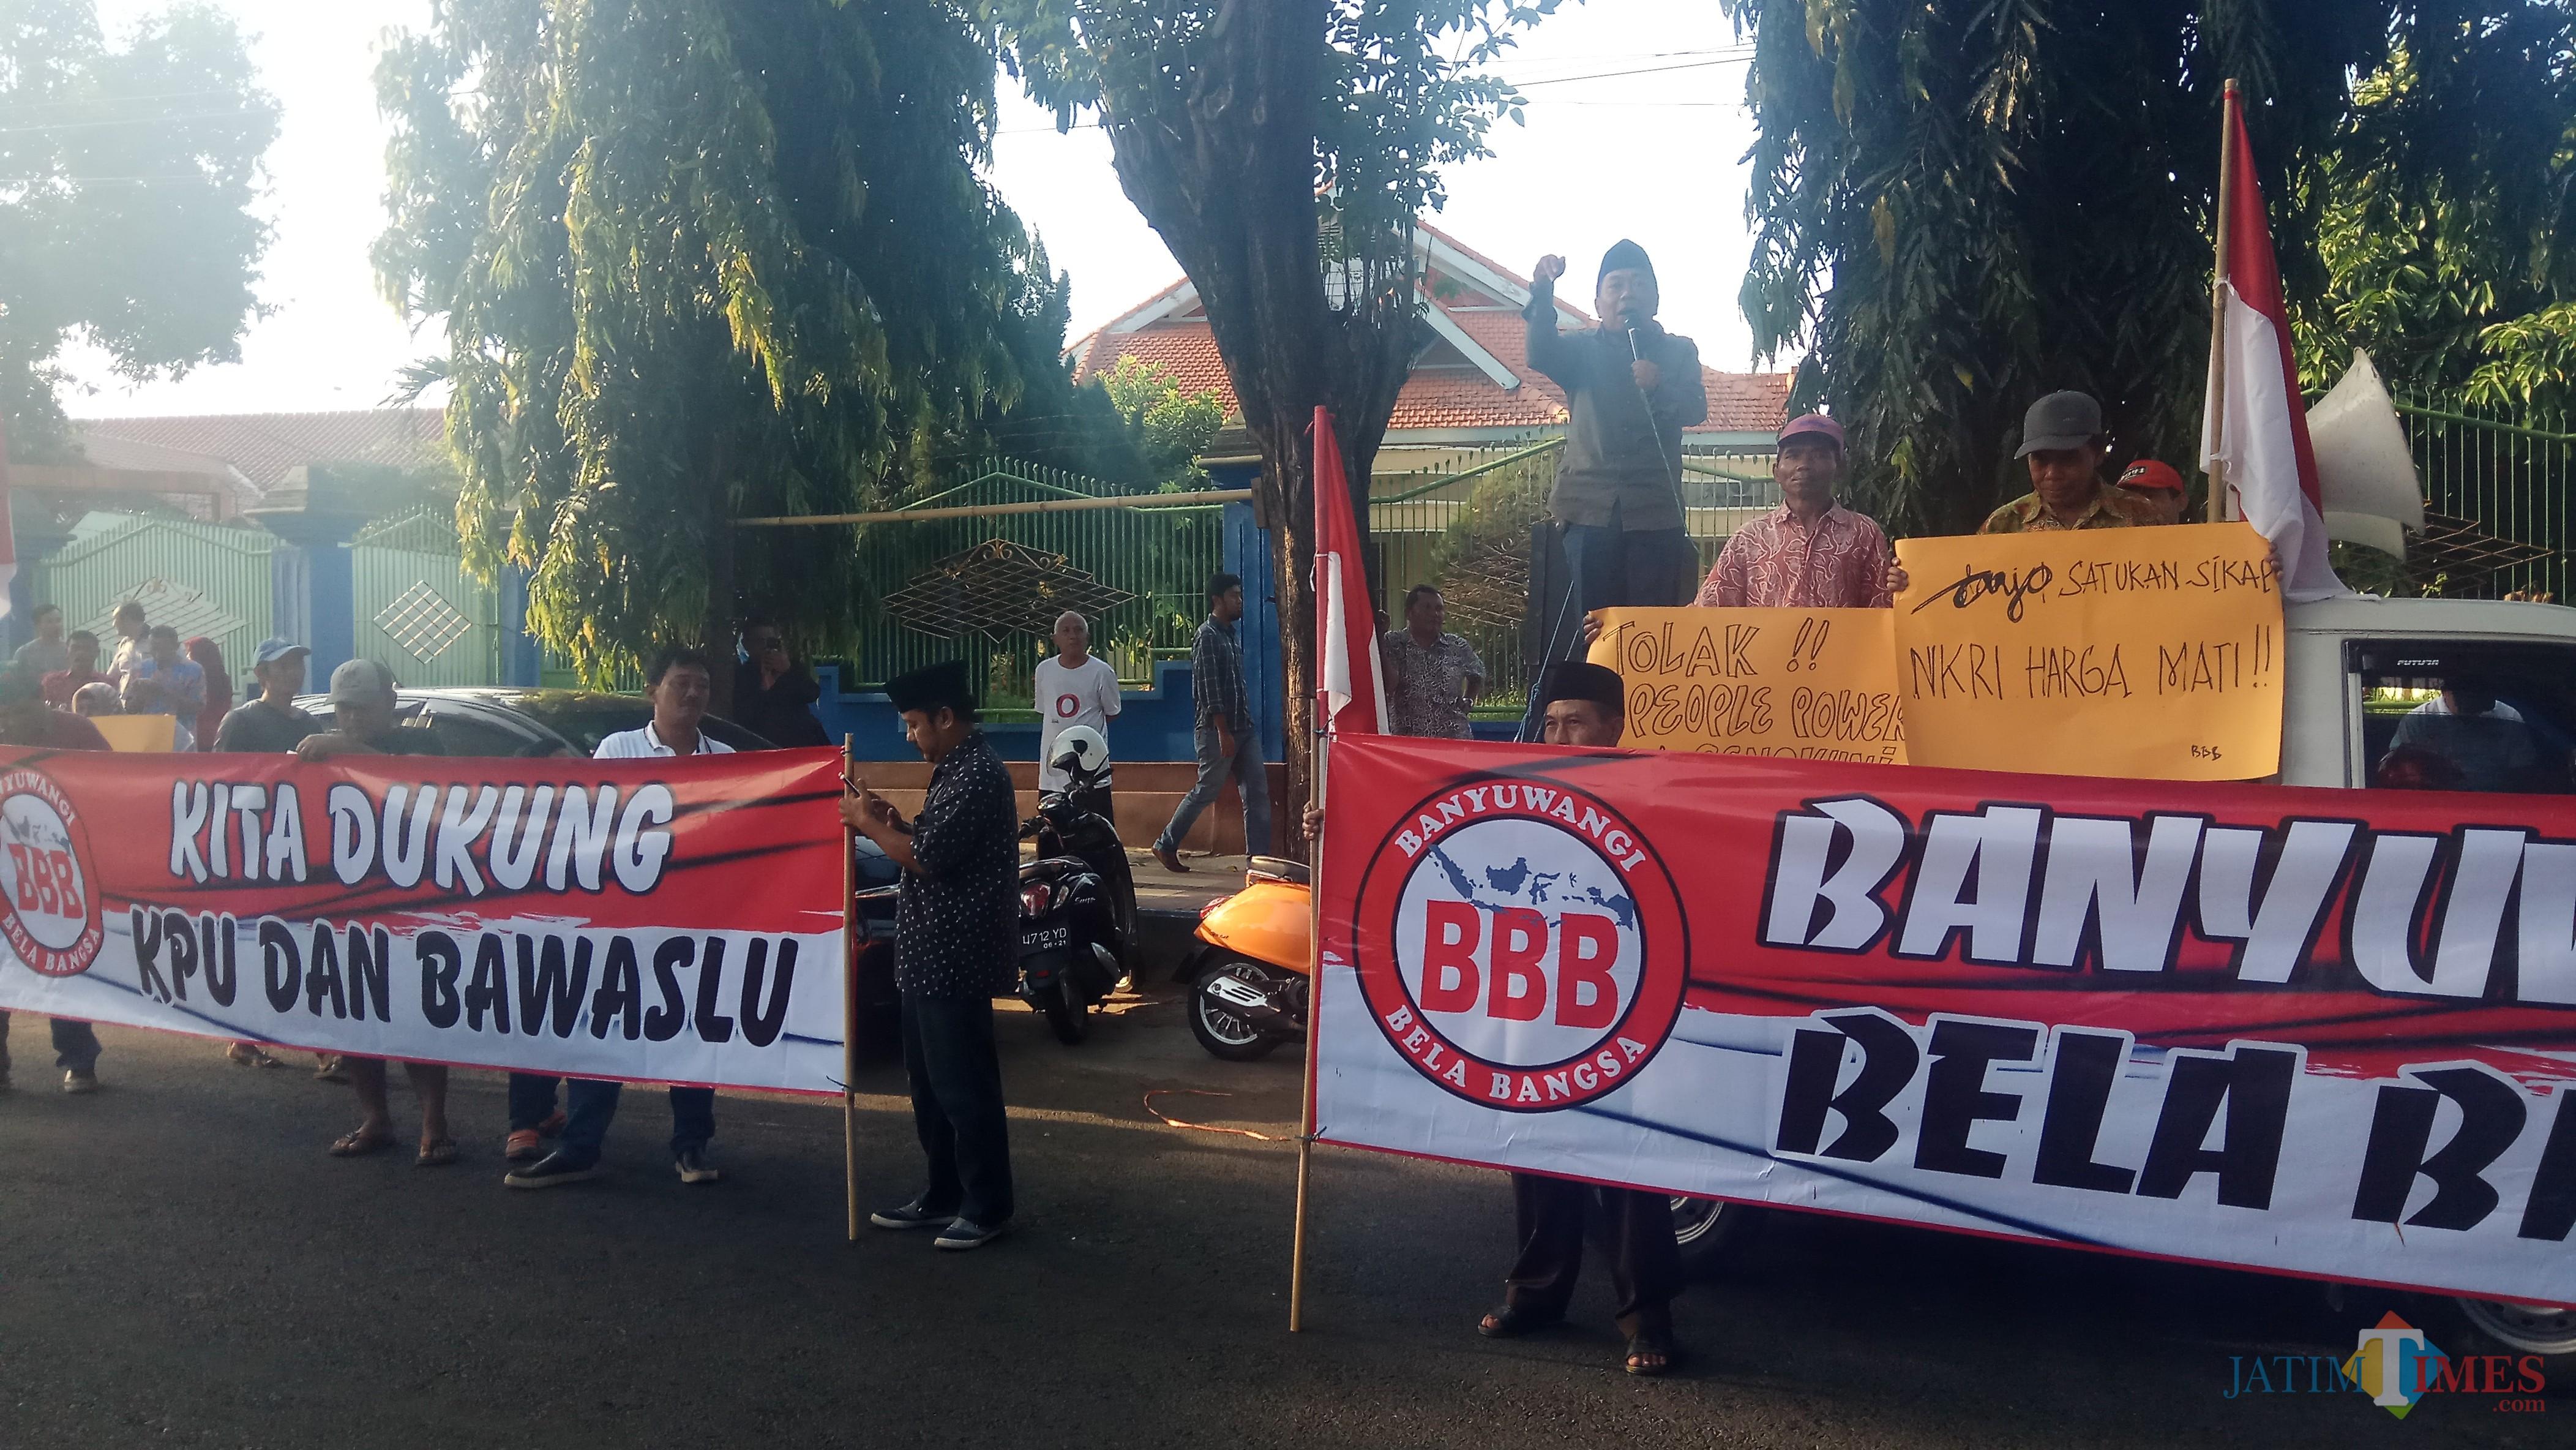 Banyuwangi Bela Bangsa melakukan orasi menolak delegitimasi KPU dan Bawaslu.